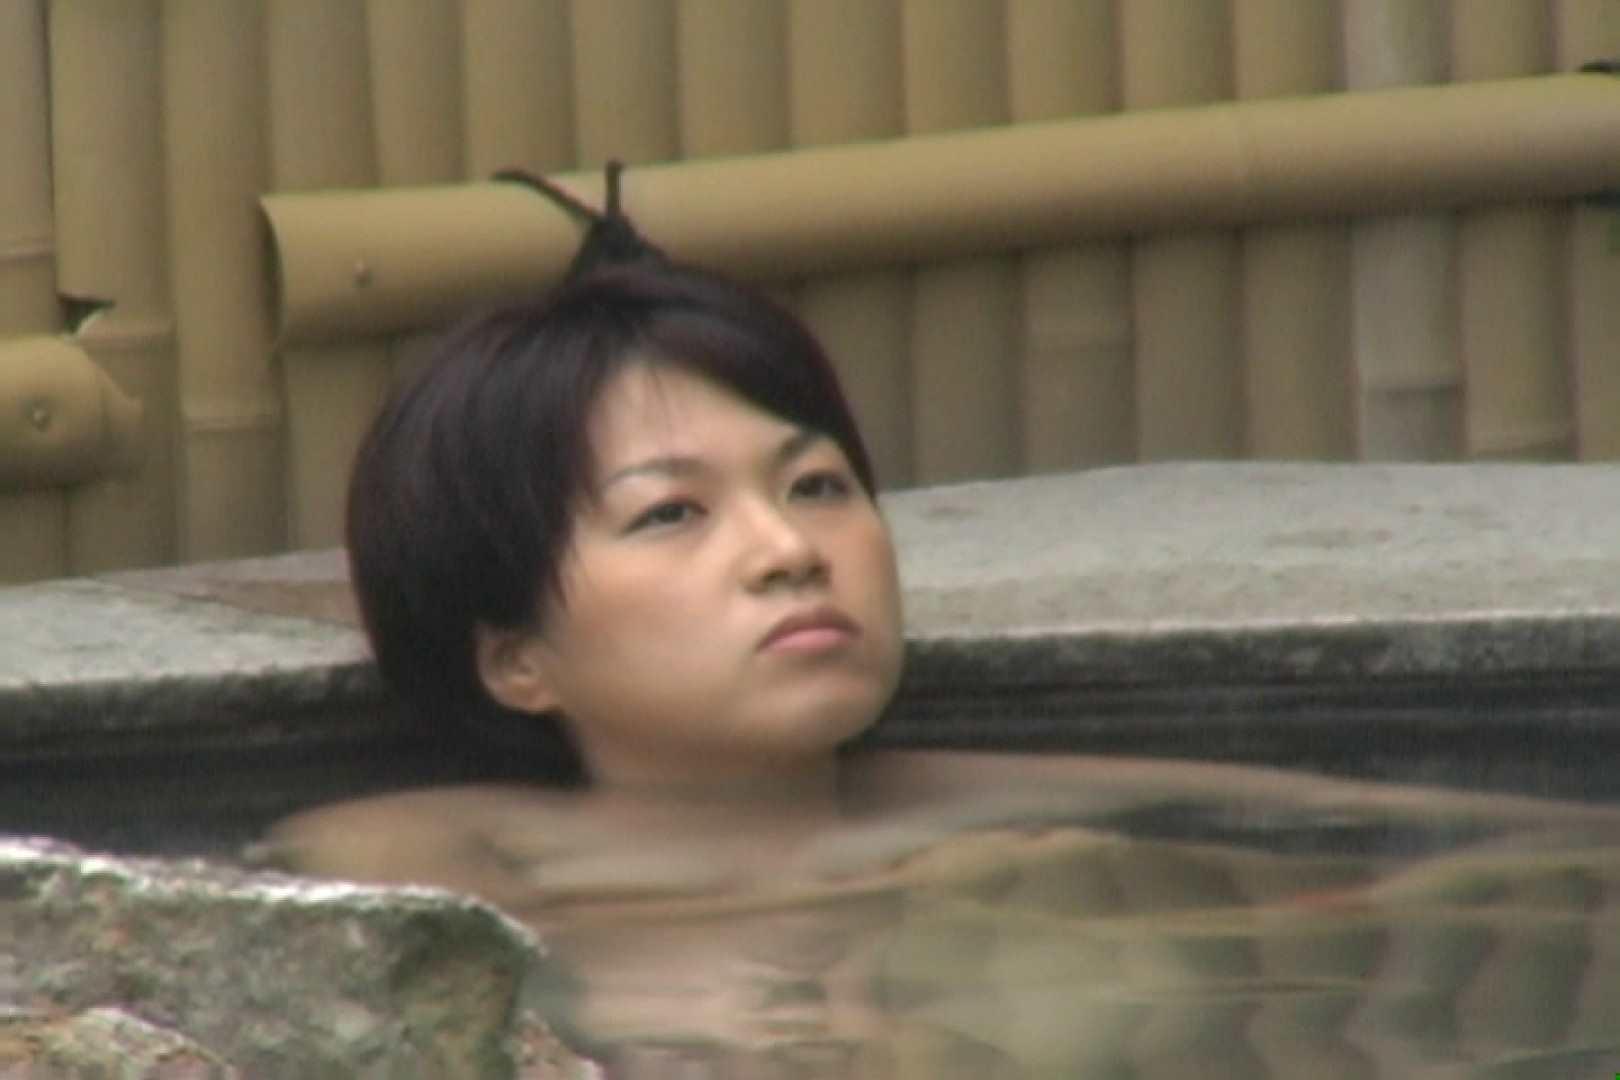 Aquaな露天風呂Vol.624 露天   OLセックス  52画像 31